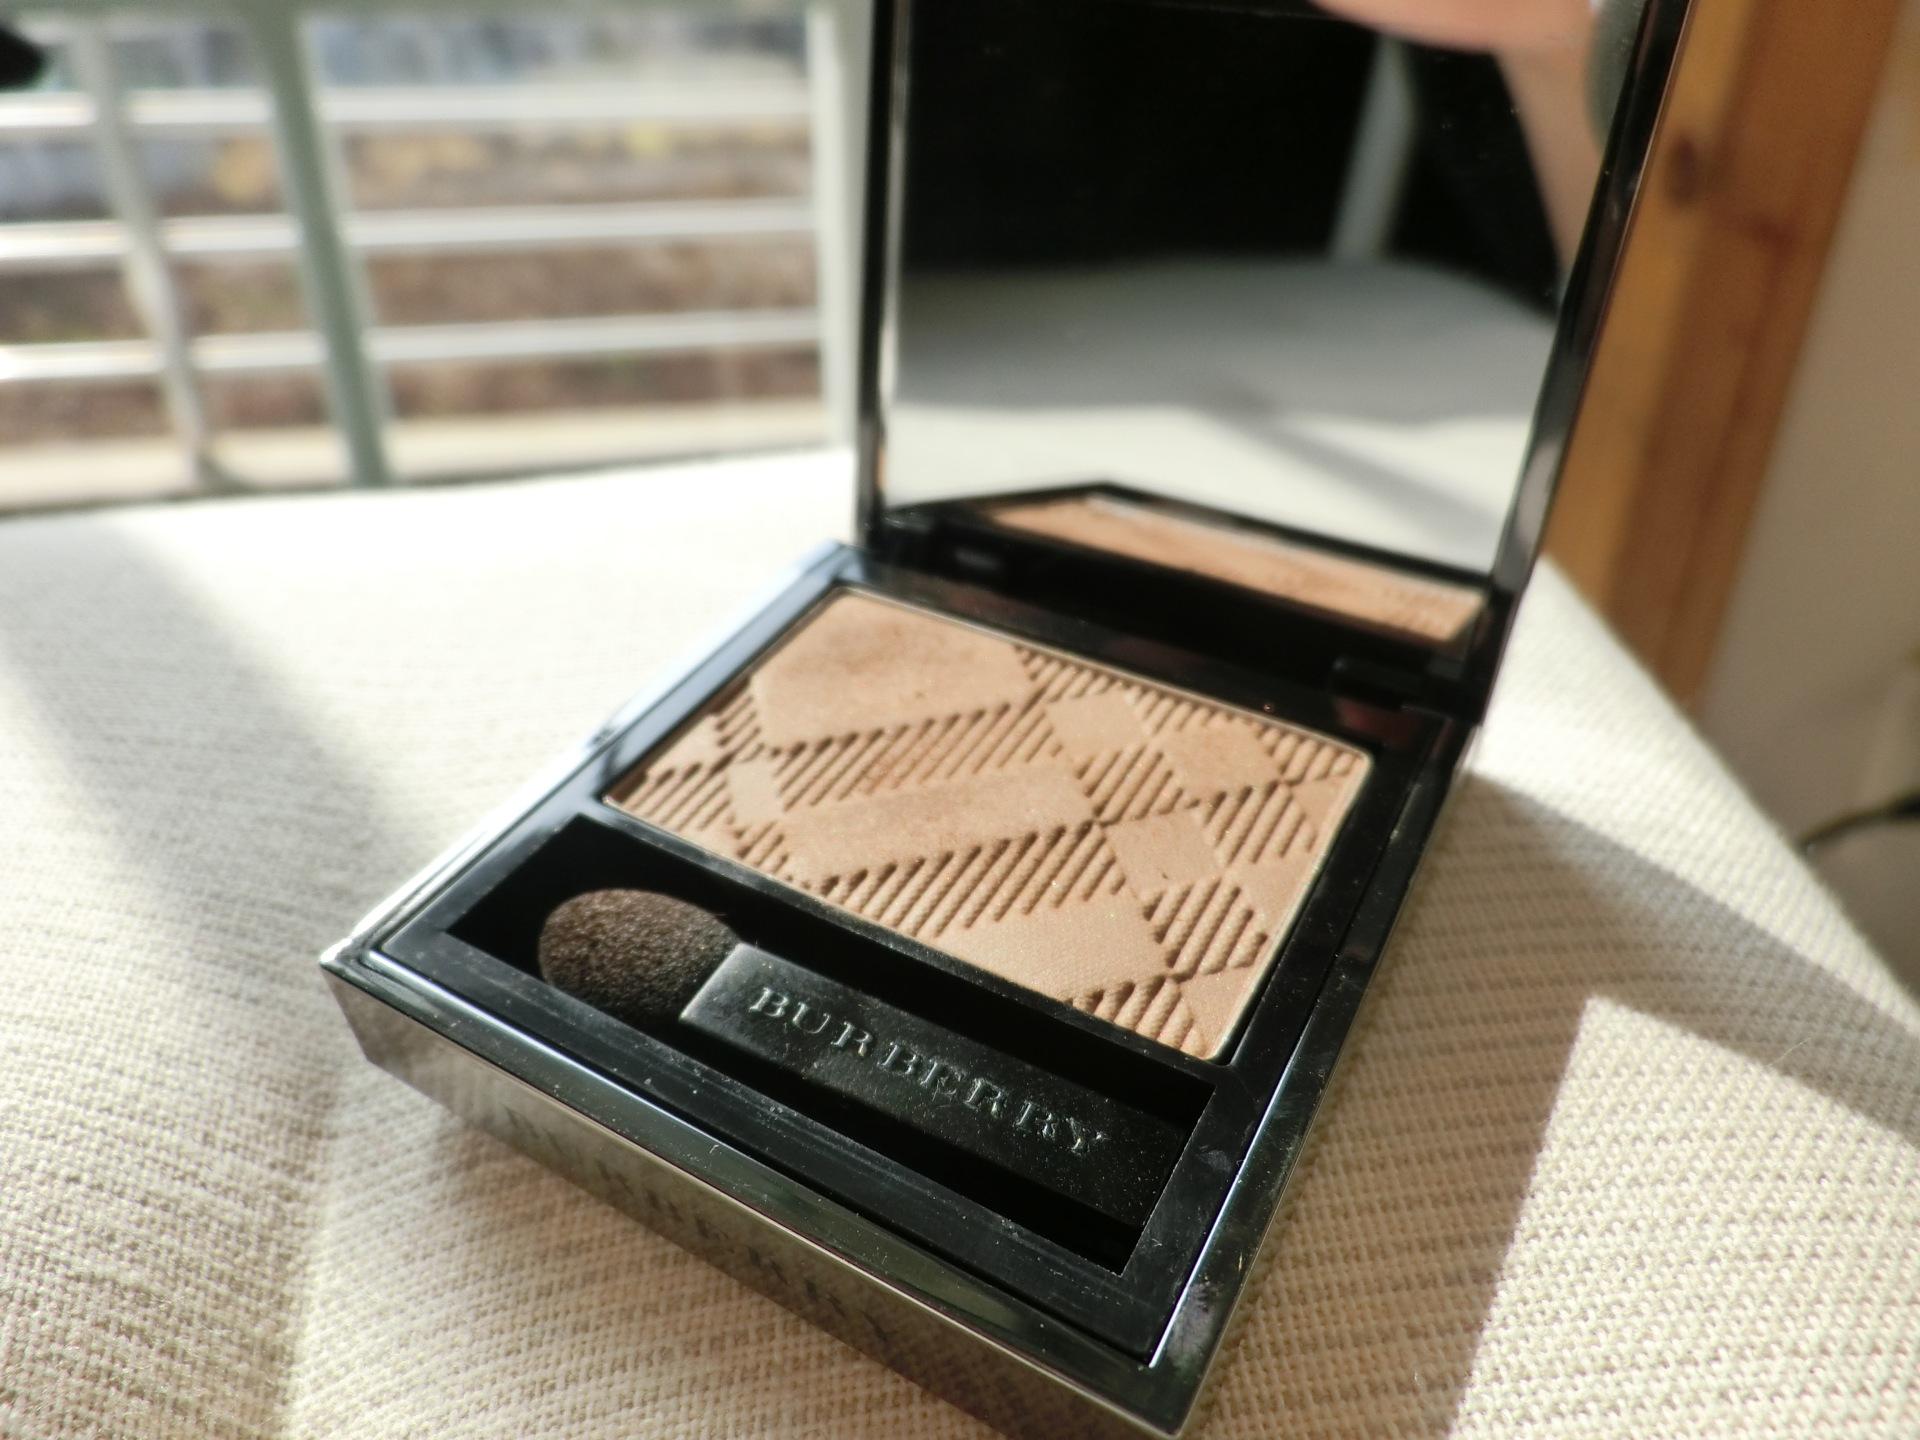 burberry-sheer-eyeshadow